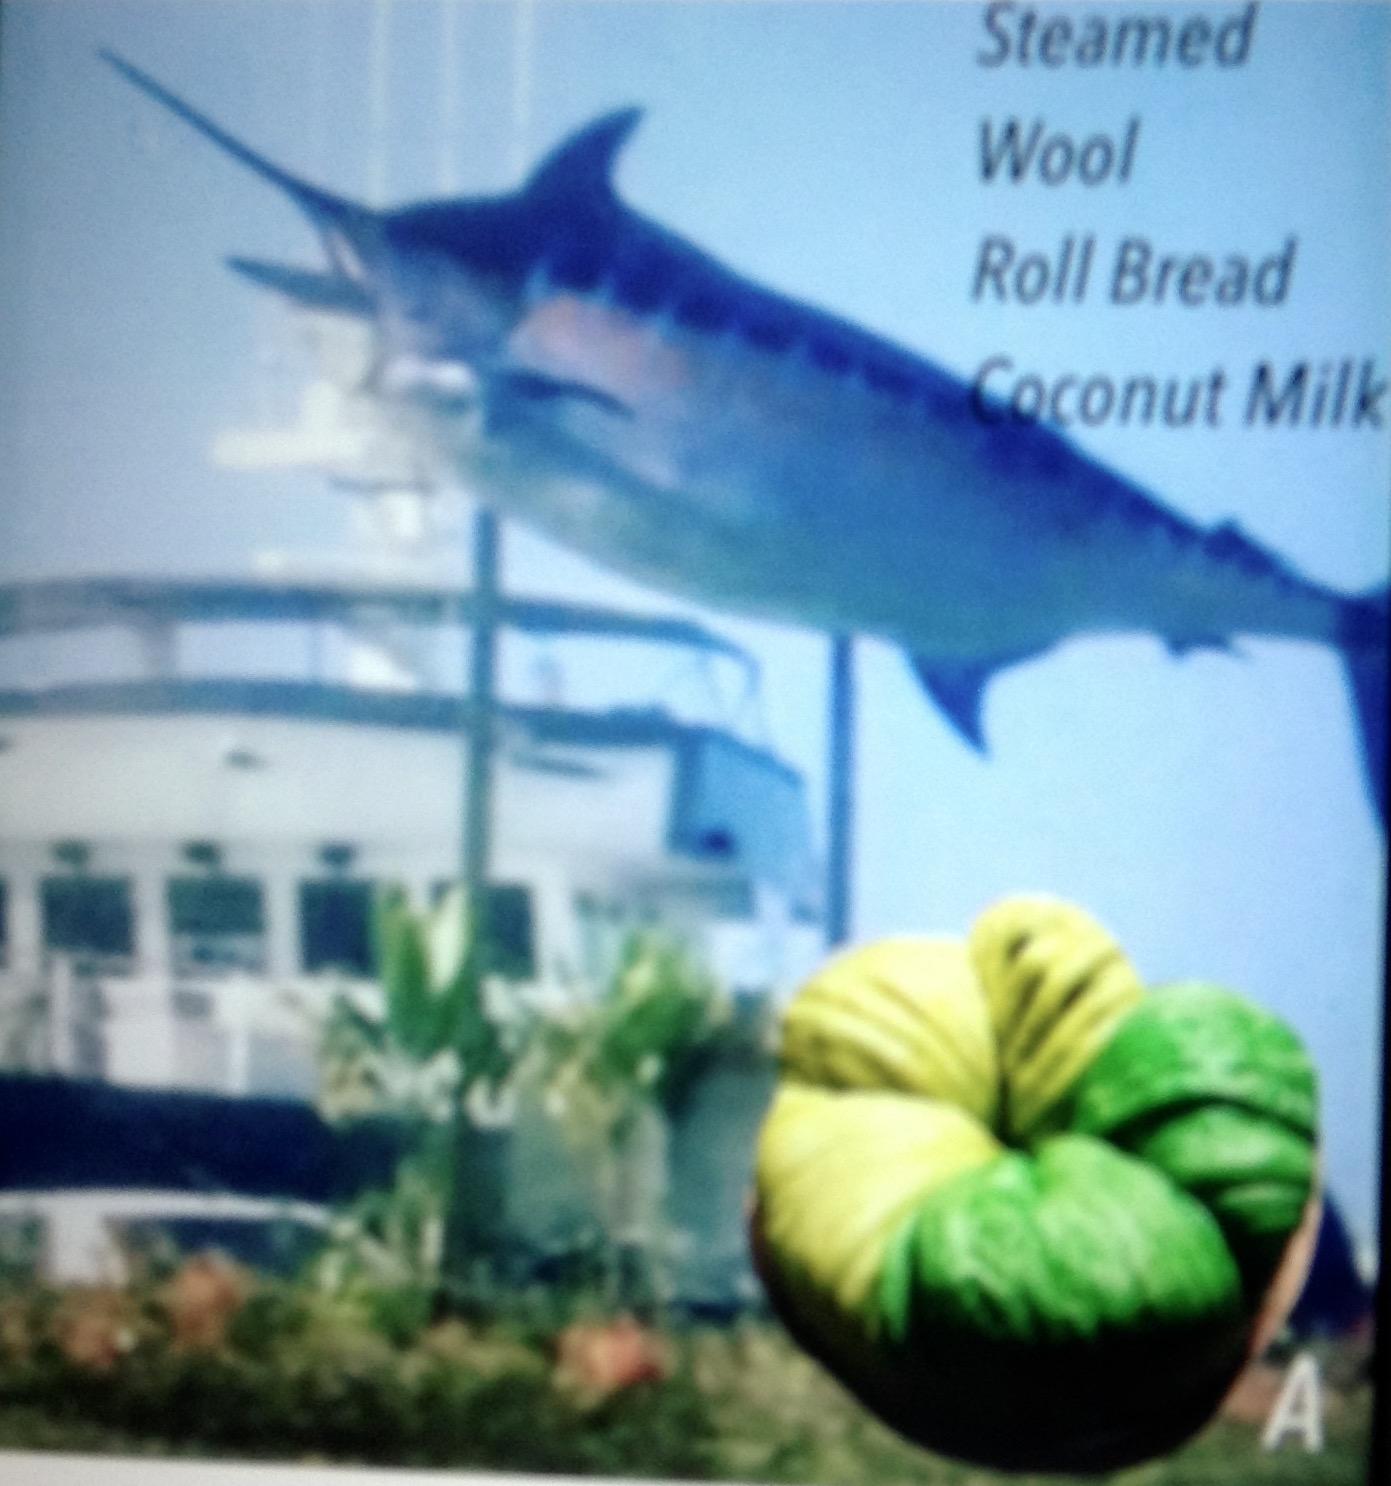 Resep Steamed Wool Roll Bread Coconut Milk